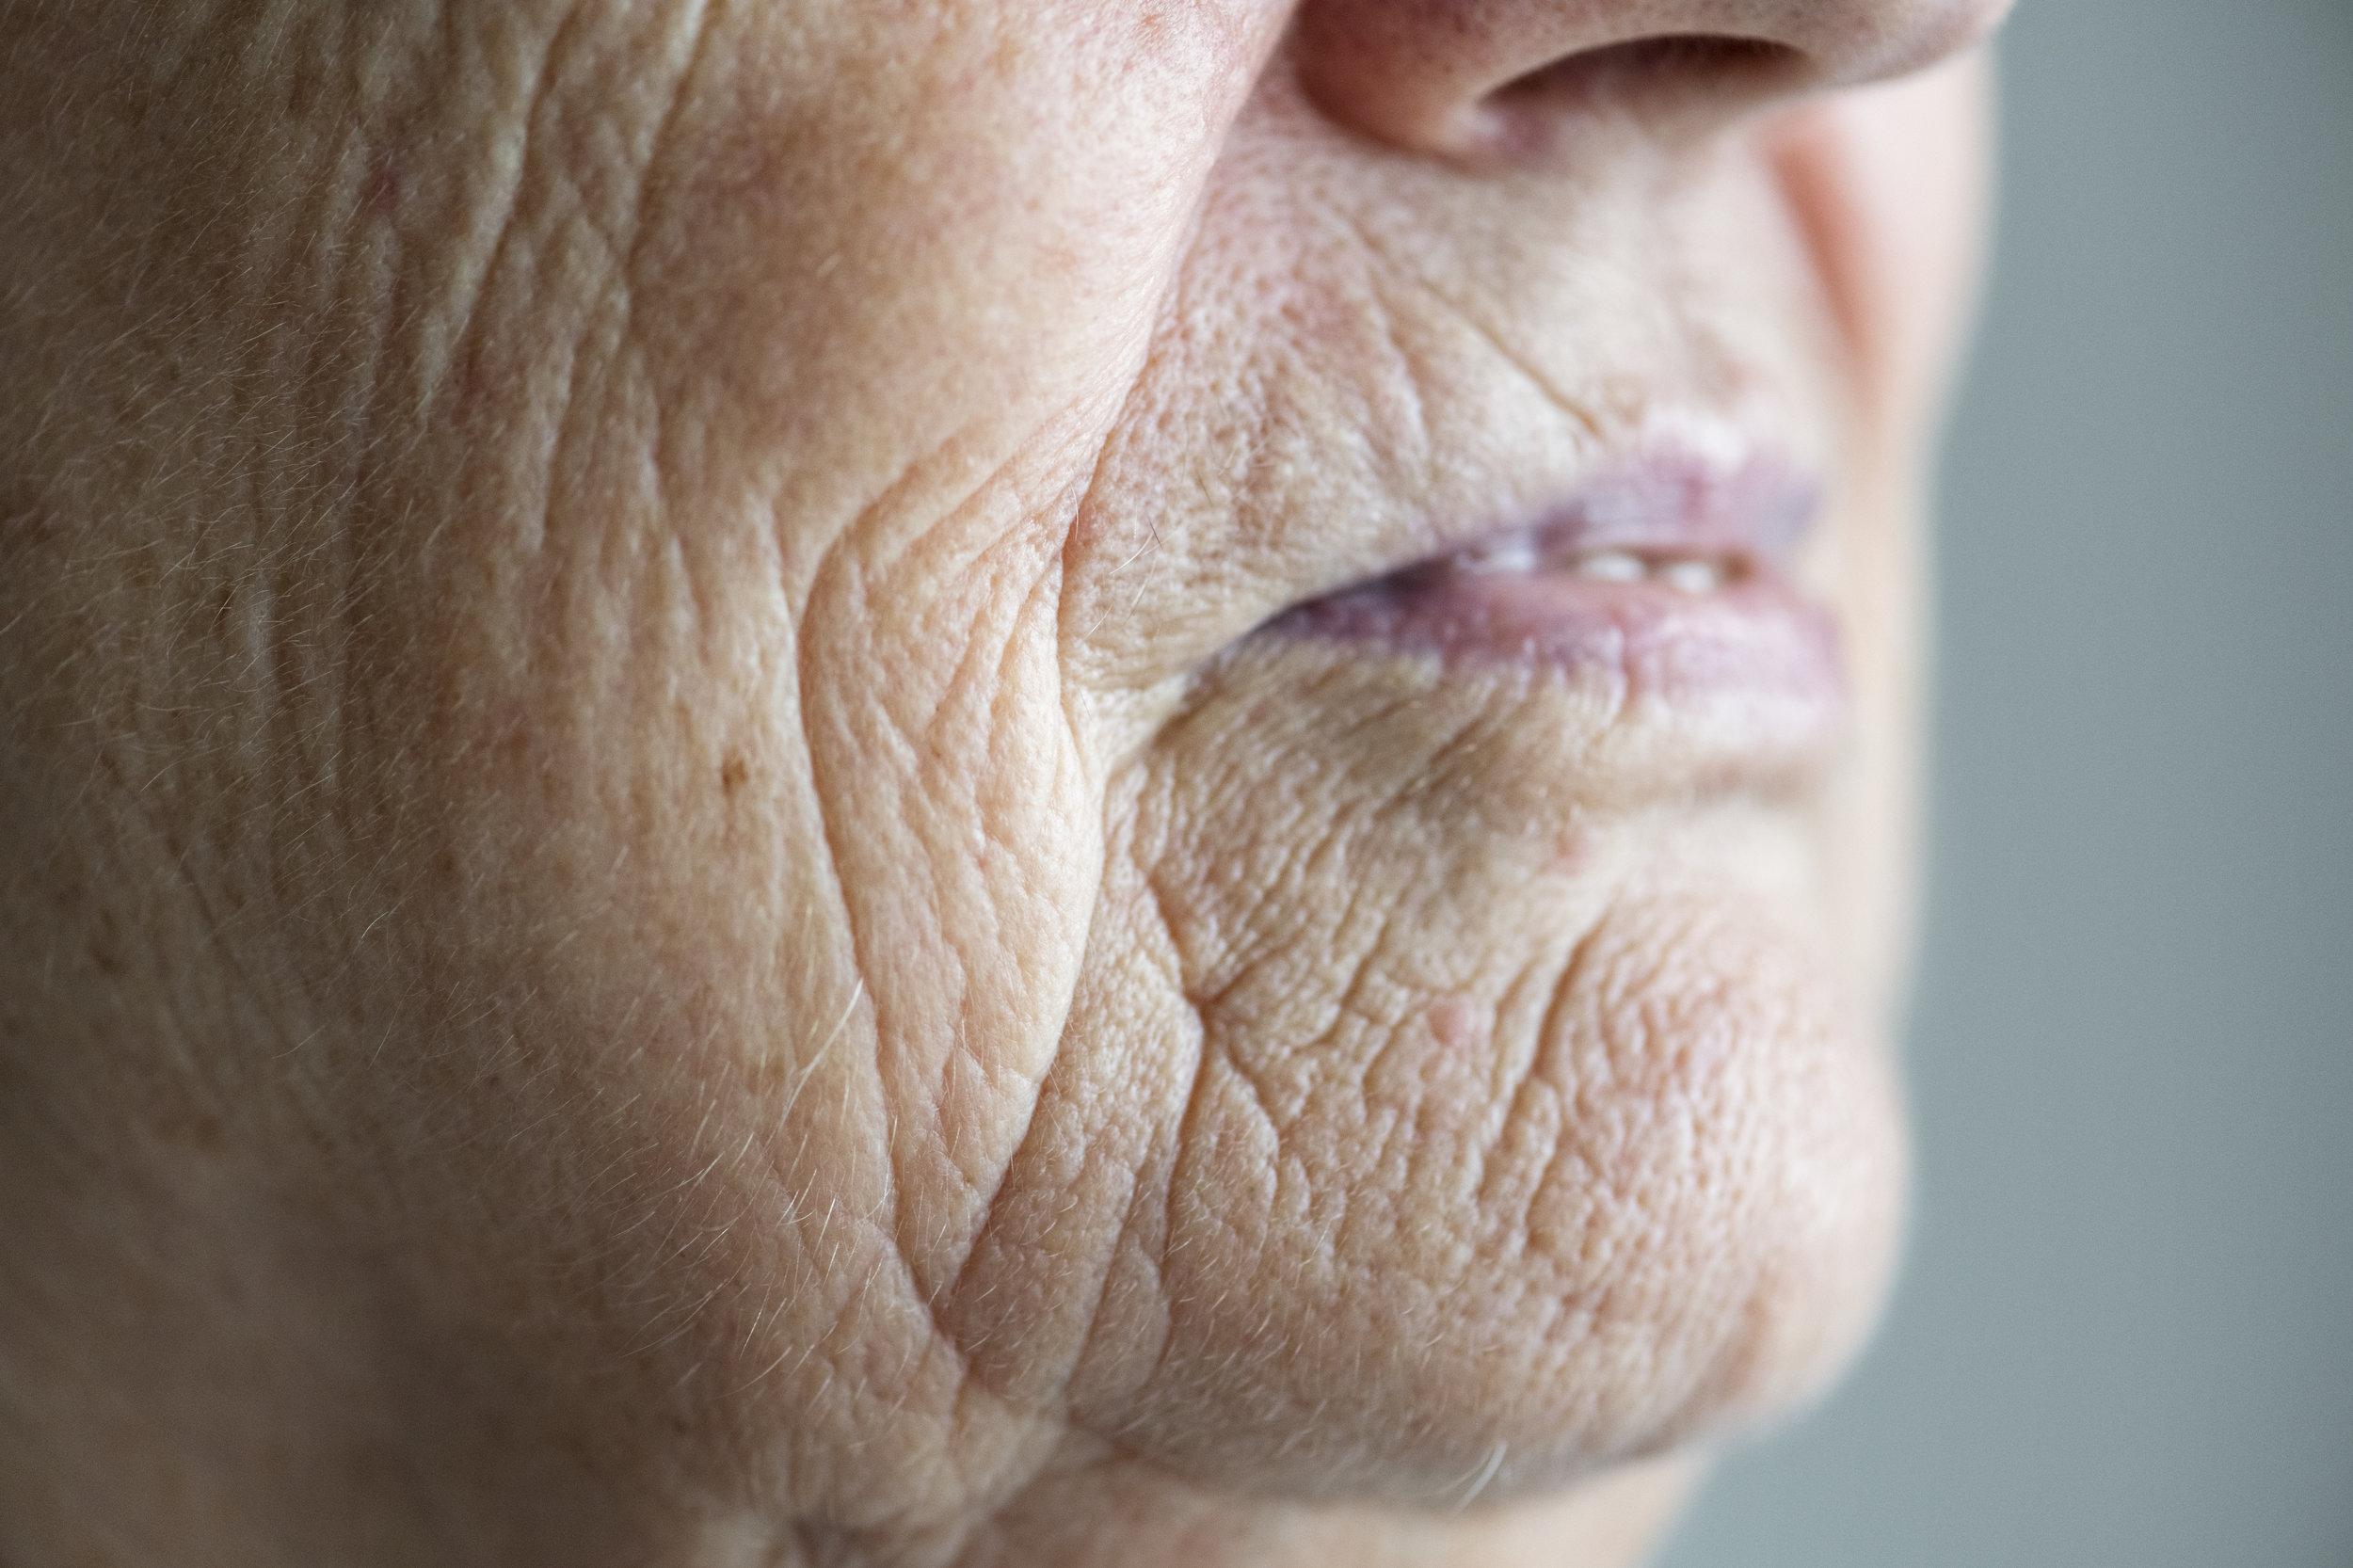 skin laxity and wrinkles.jpeg